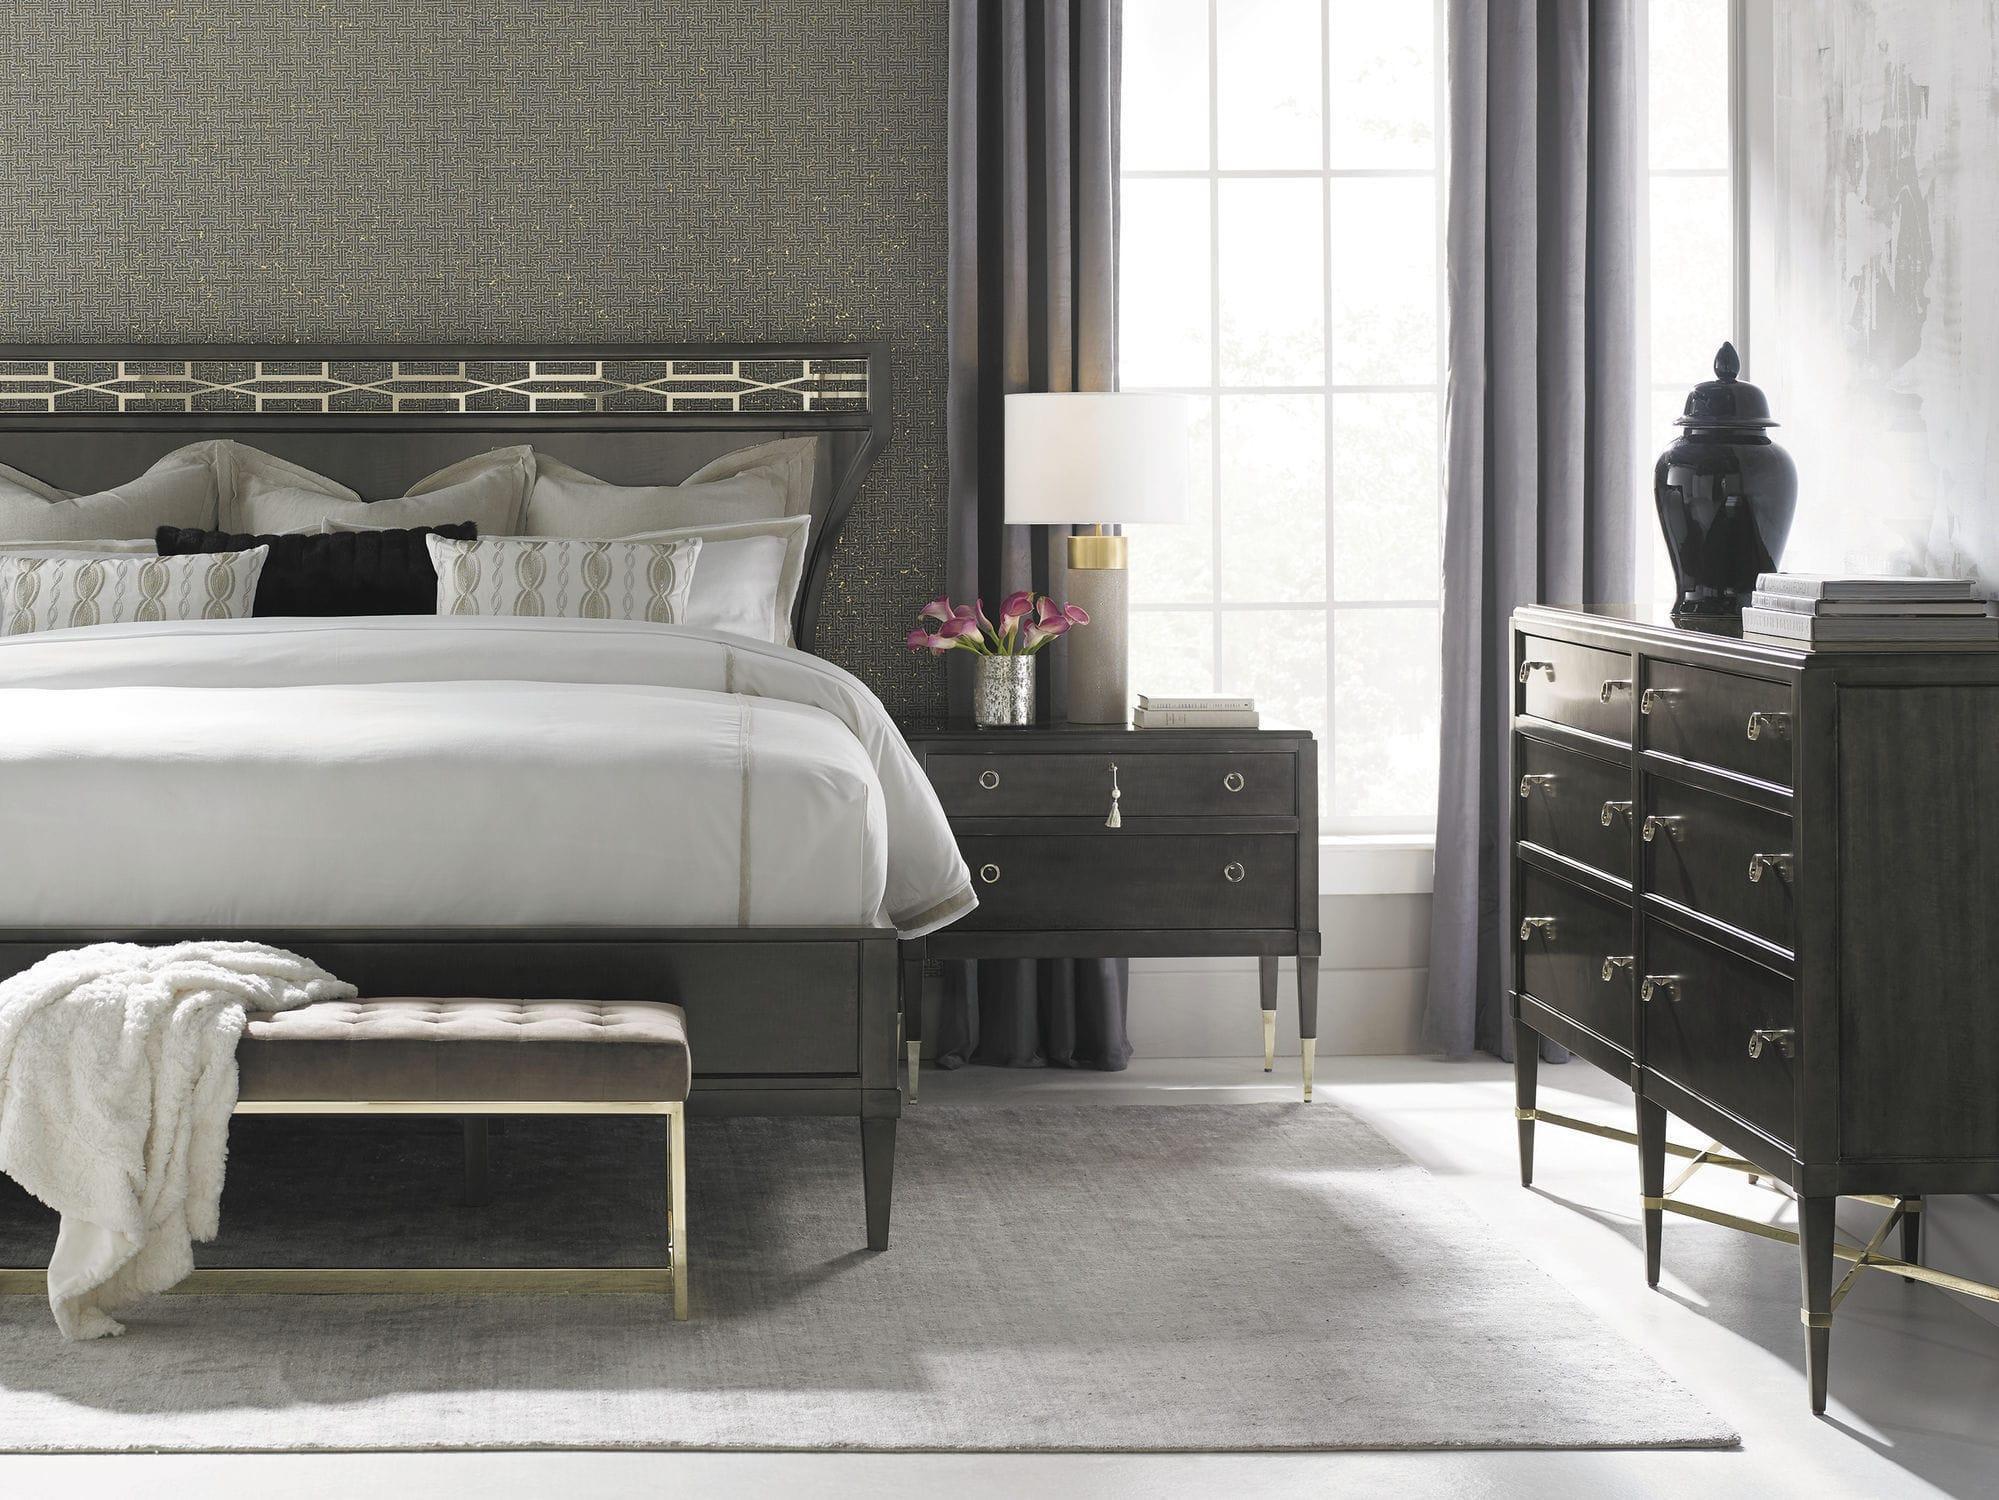 Astonishing Contemporary Upholstered Bench Velvet Gold Plated Inzonedesignstudio Interior Chair Design Inzonedesignstudiocom